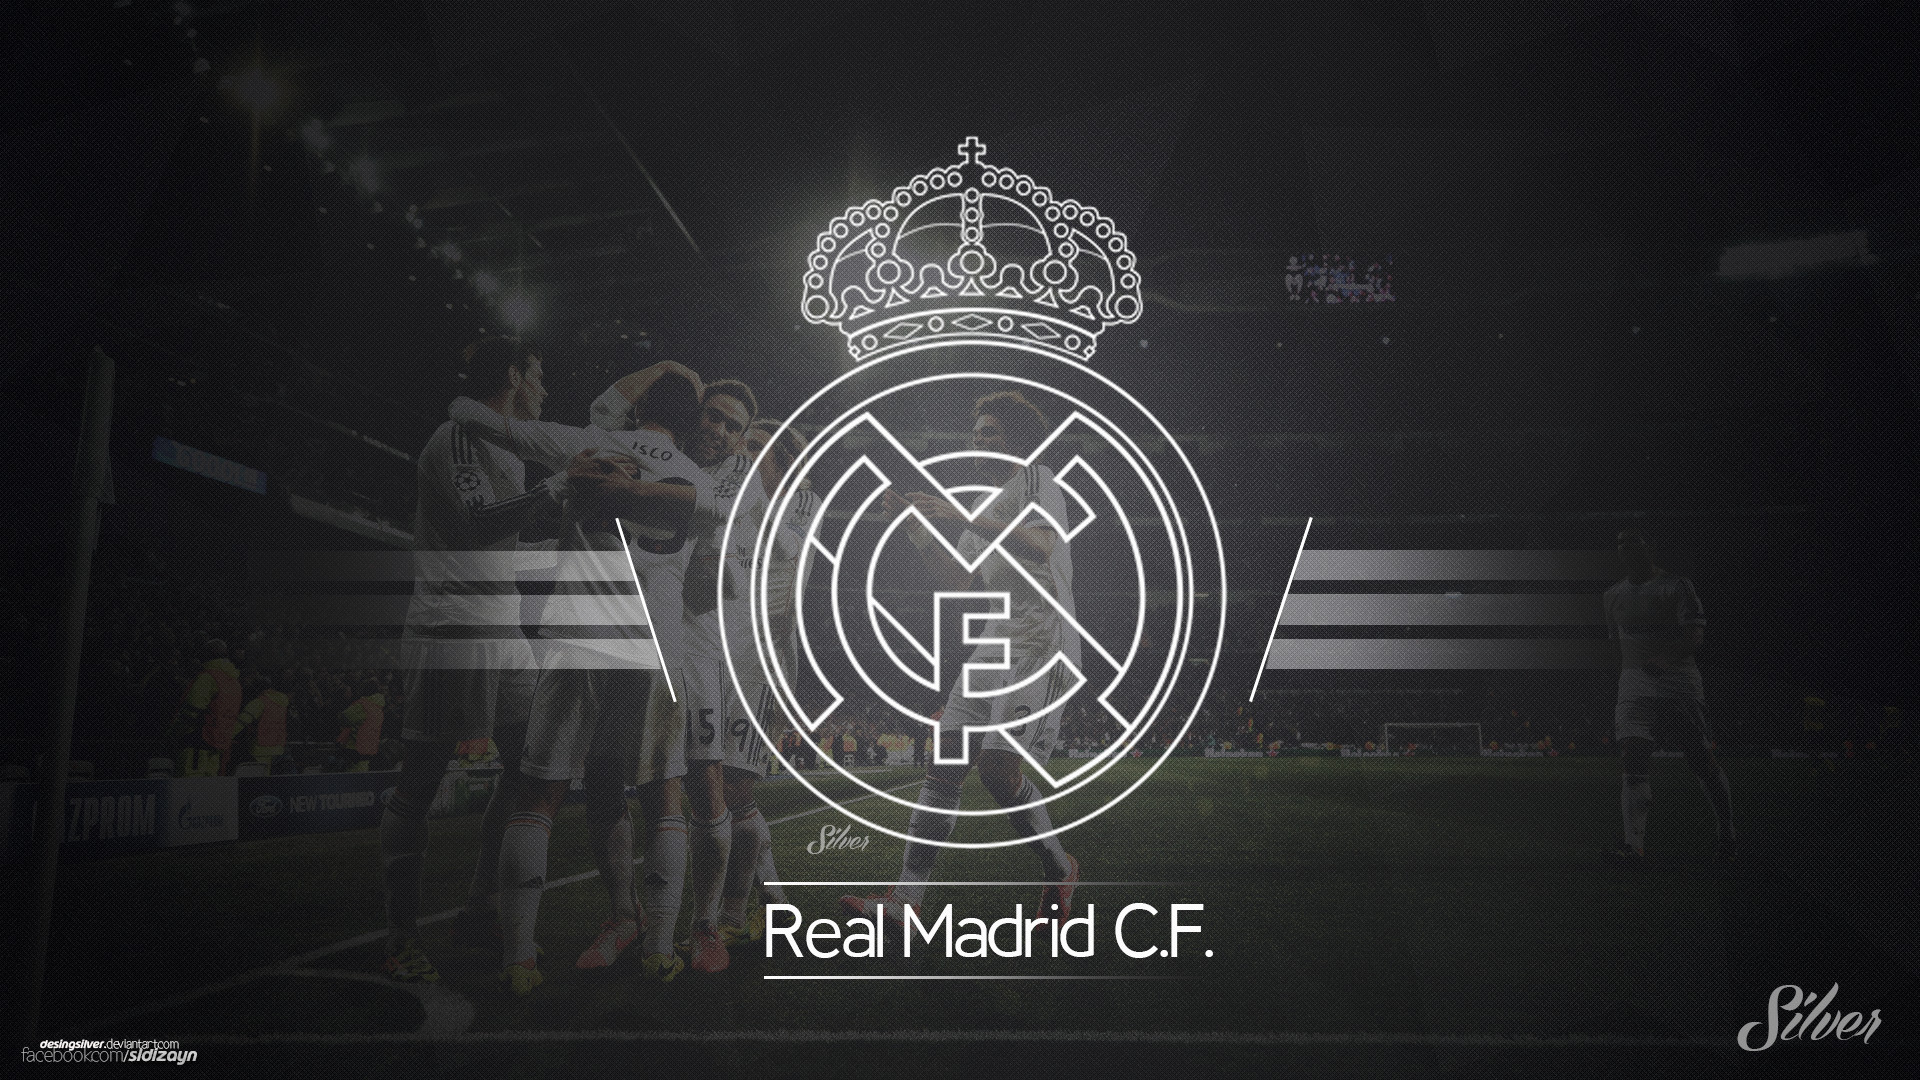 Real Madrid Logo Wallpaper 66 images 1920x1080